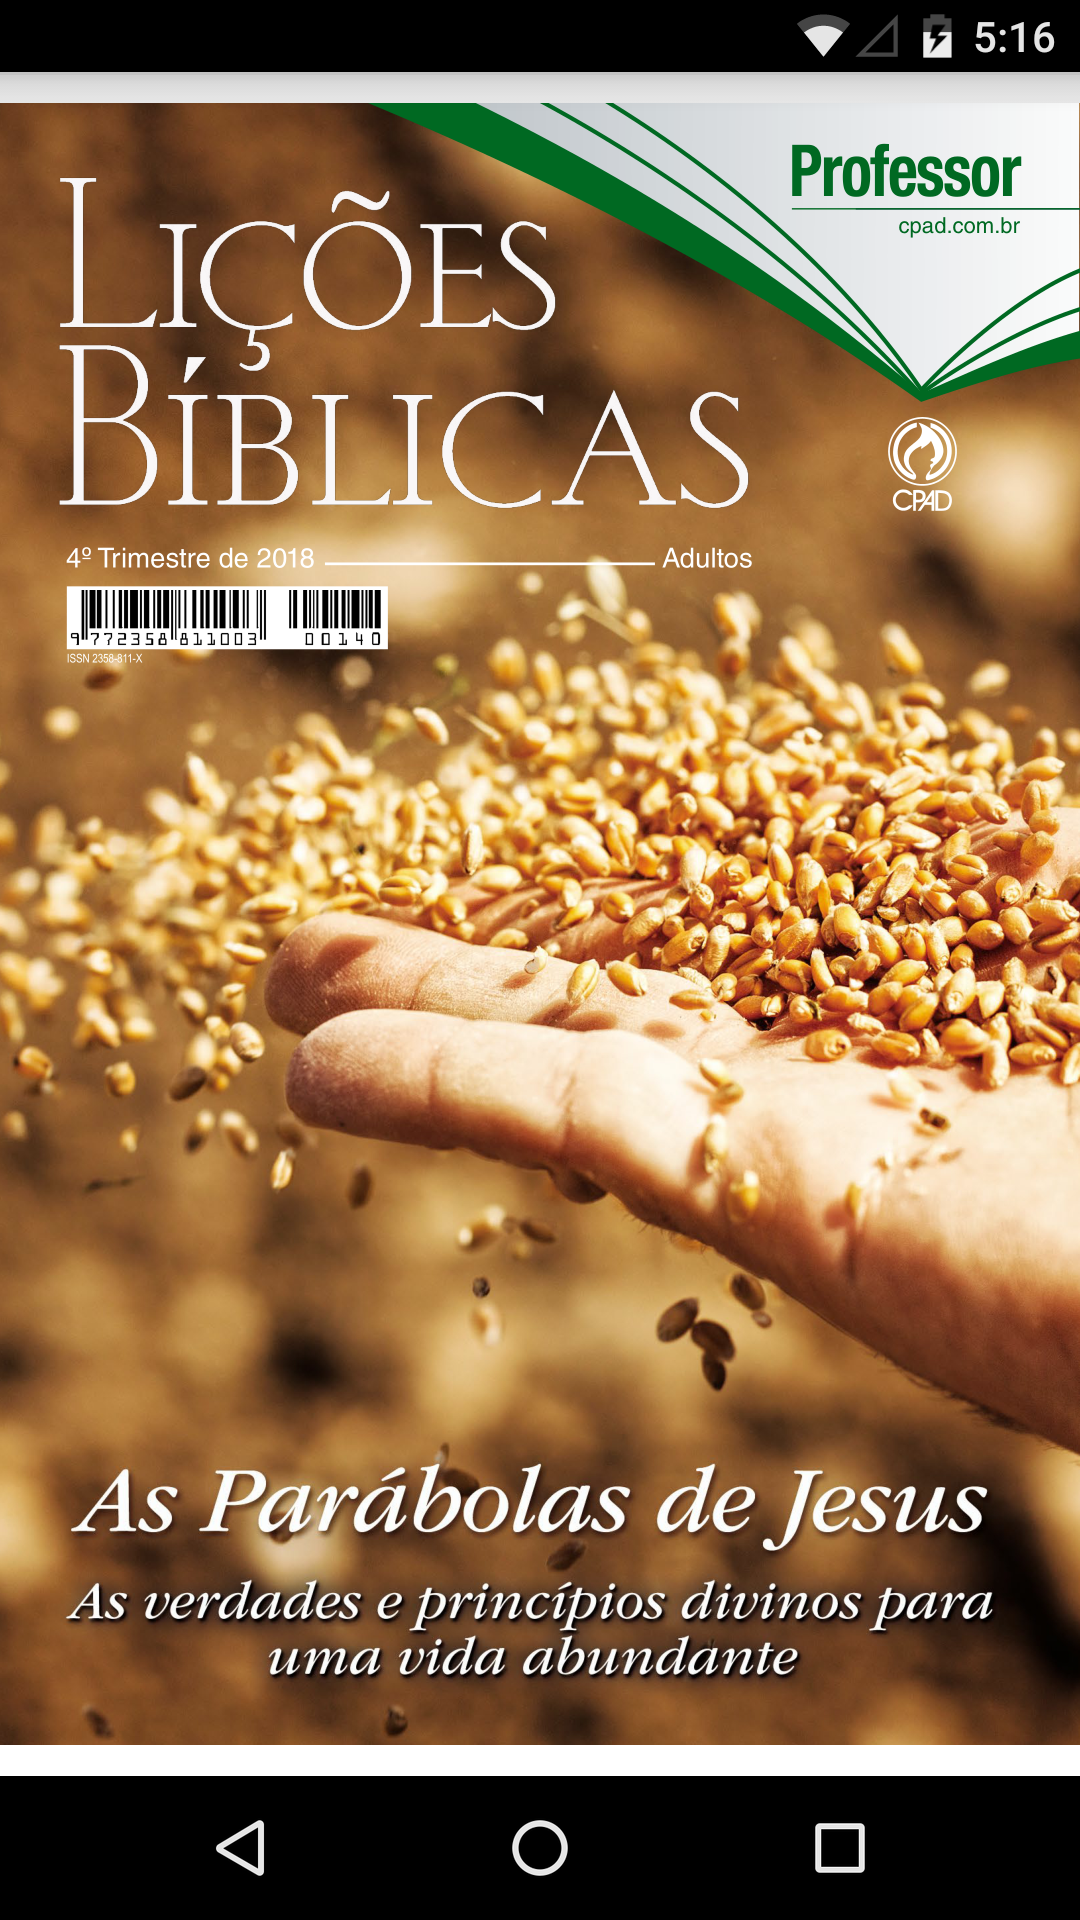 1 REVISTA DA TRIMESTRE DOMINICAL BAIXAR ESCOLA 2013